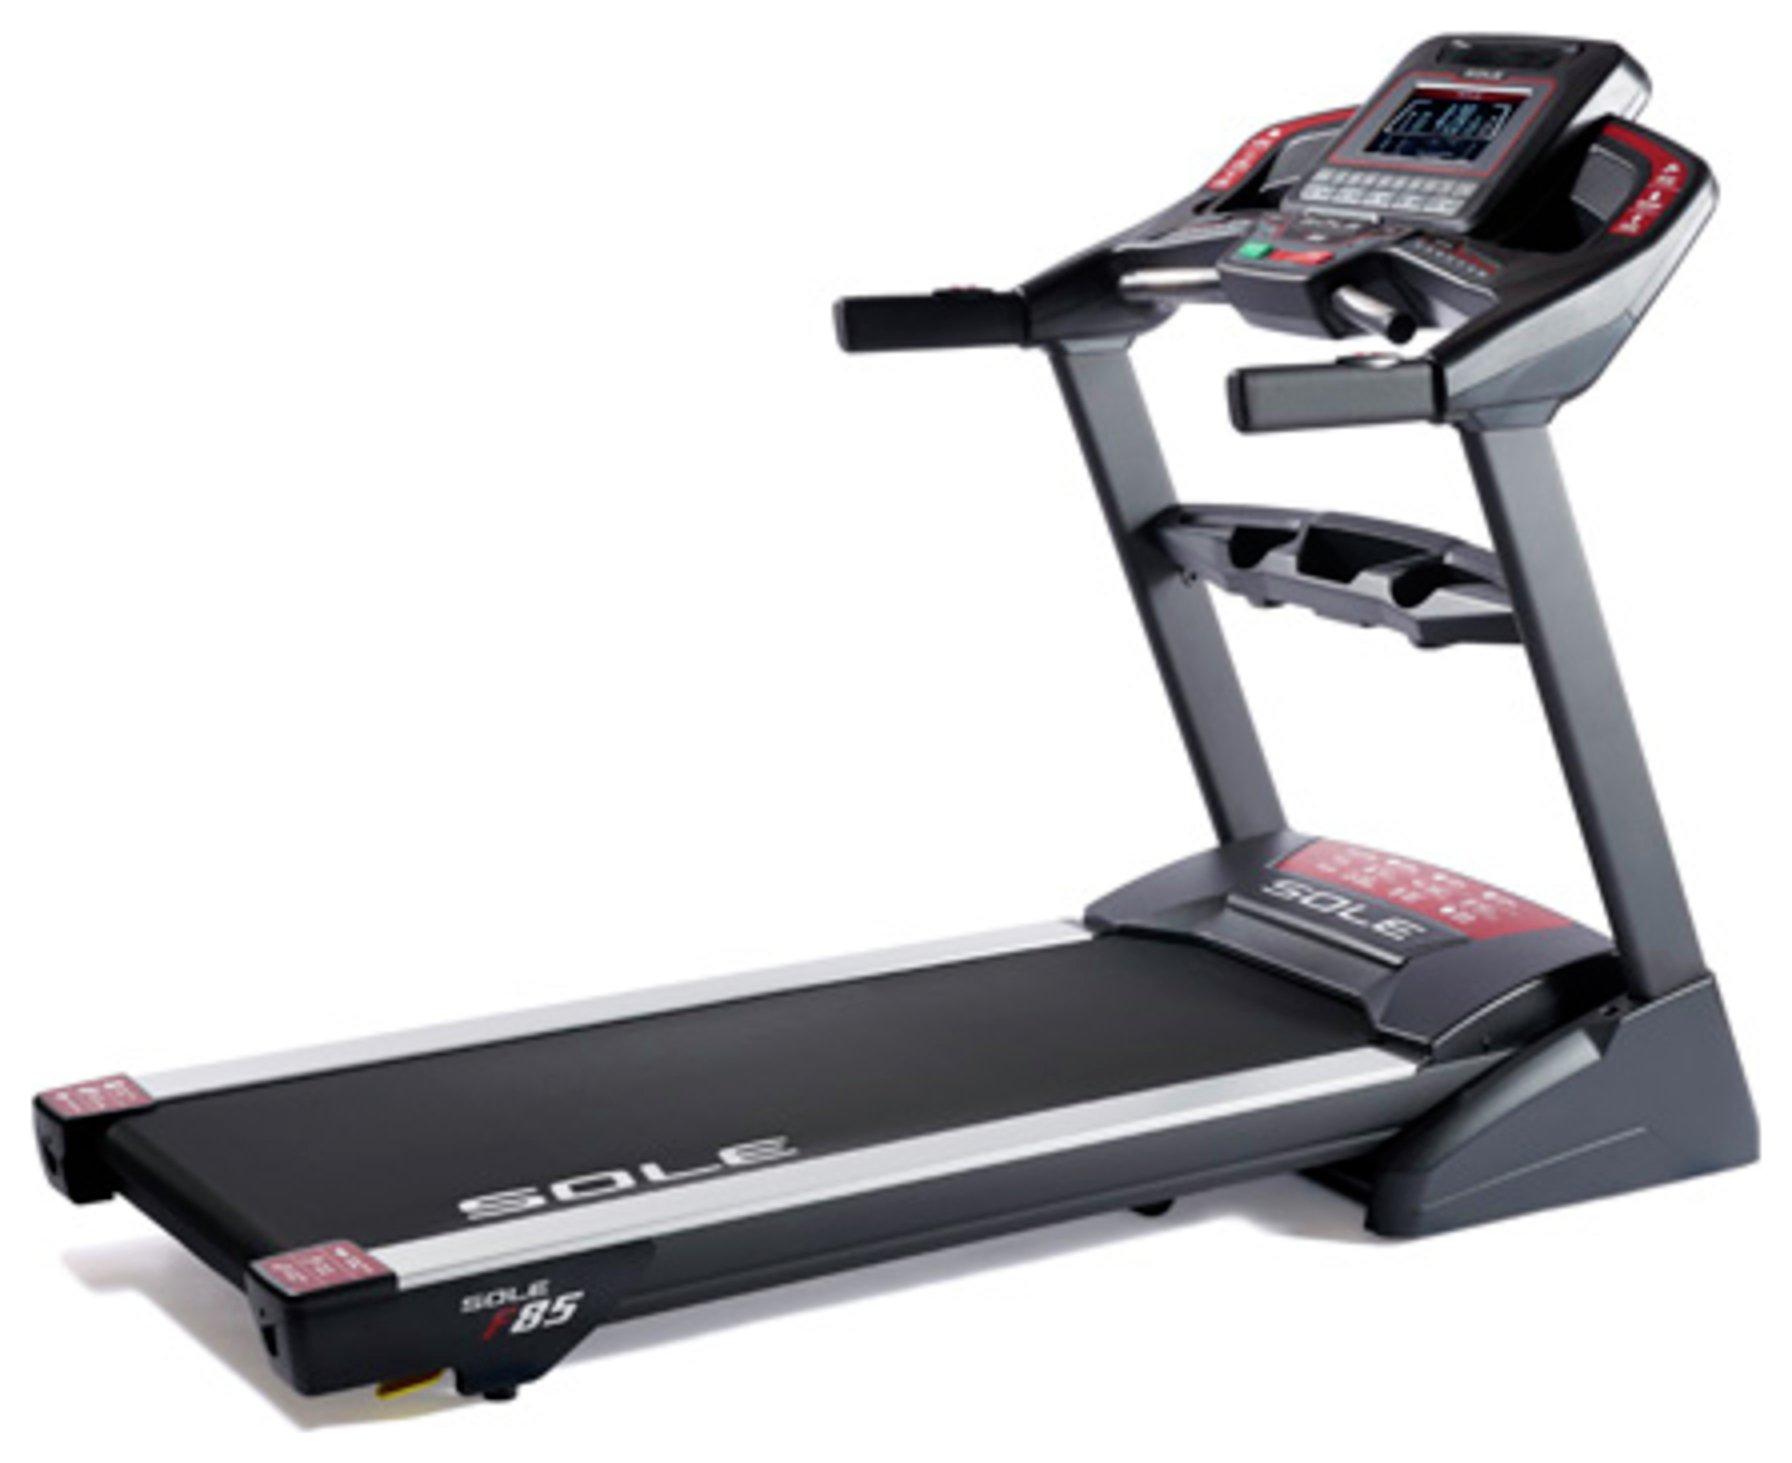 Sole Fitness - F85 2016 Treadmill lowest price